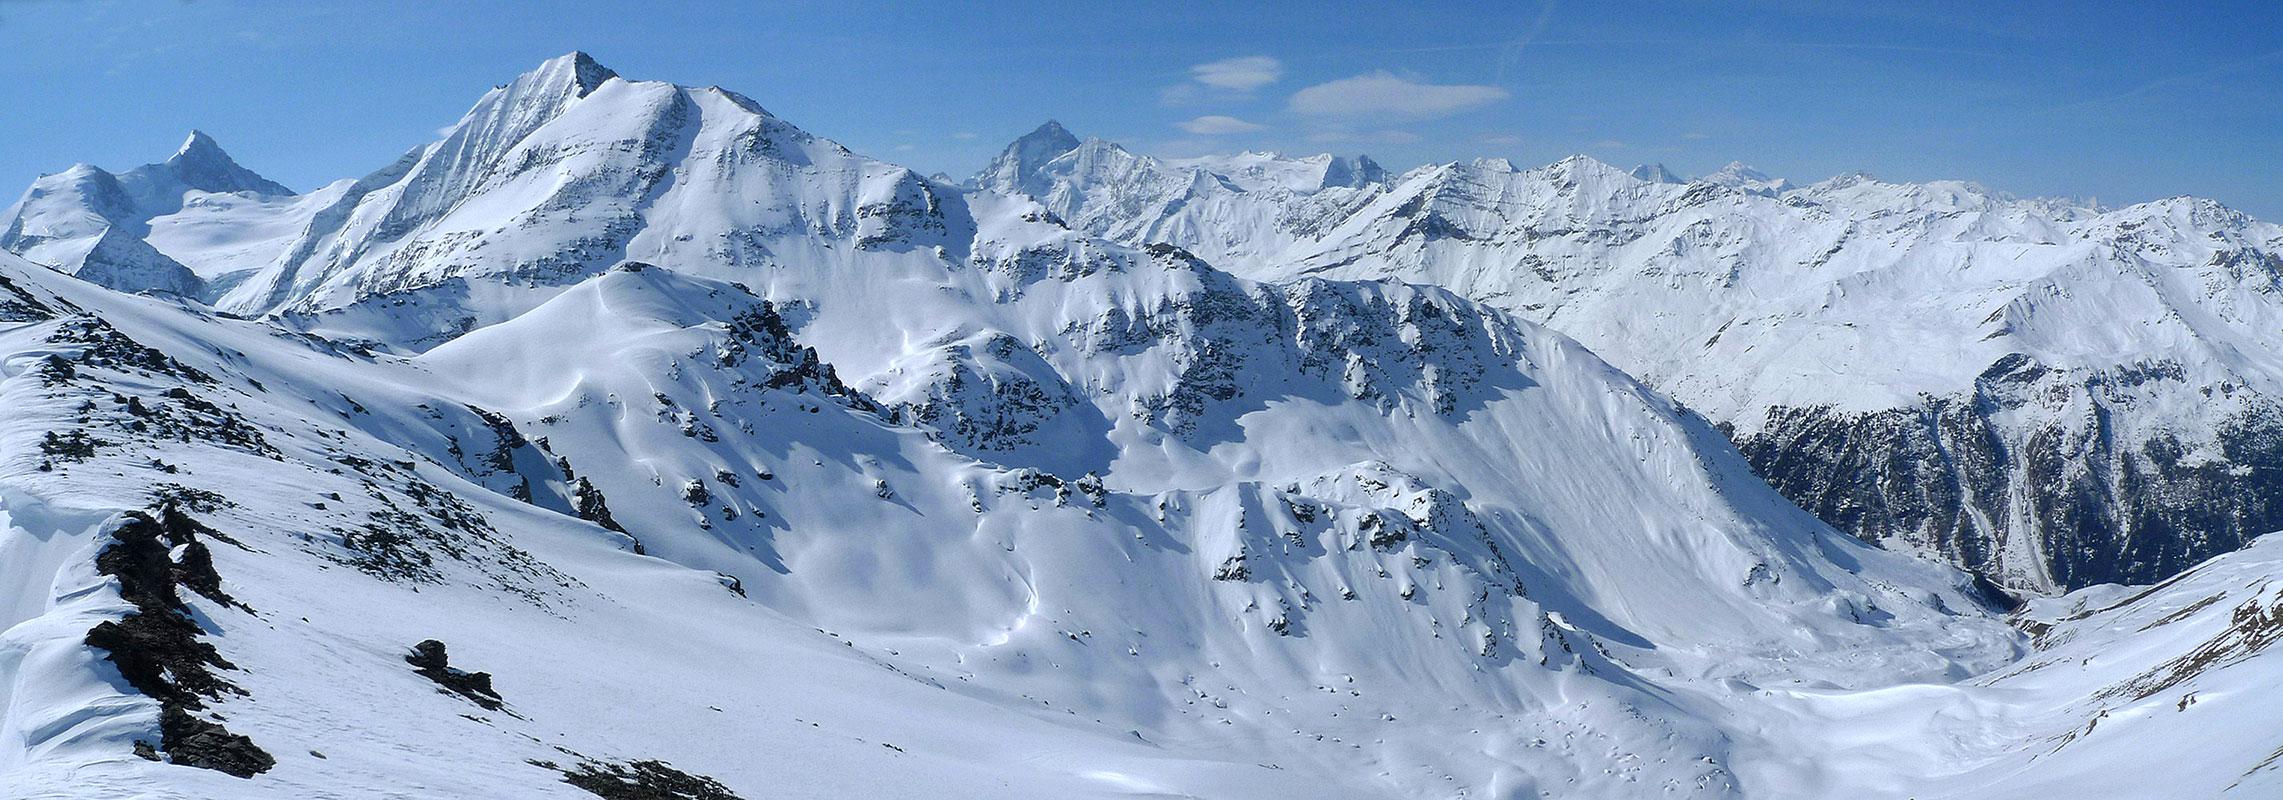 L´Omen Roso Walliser Alpen / Alpes valaisannes Schweiz panorama 33